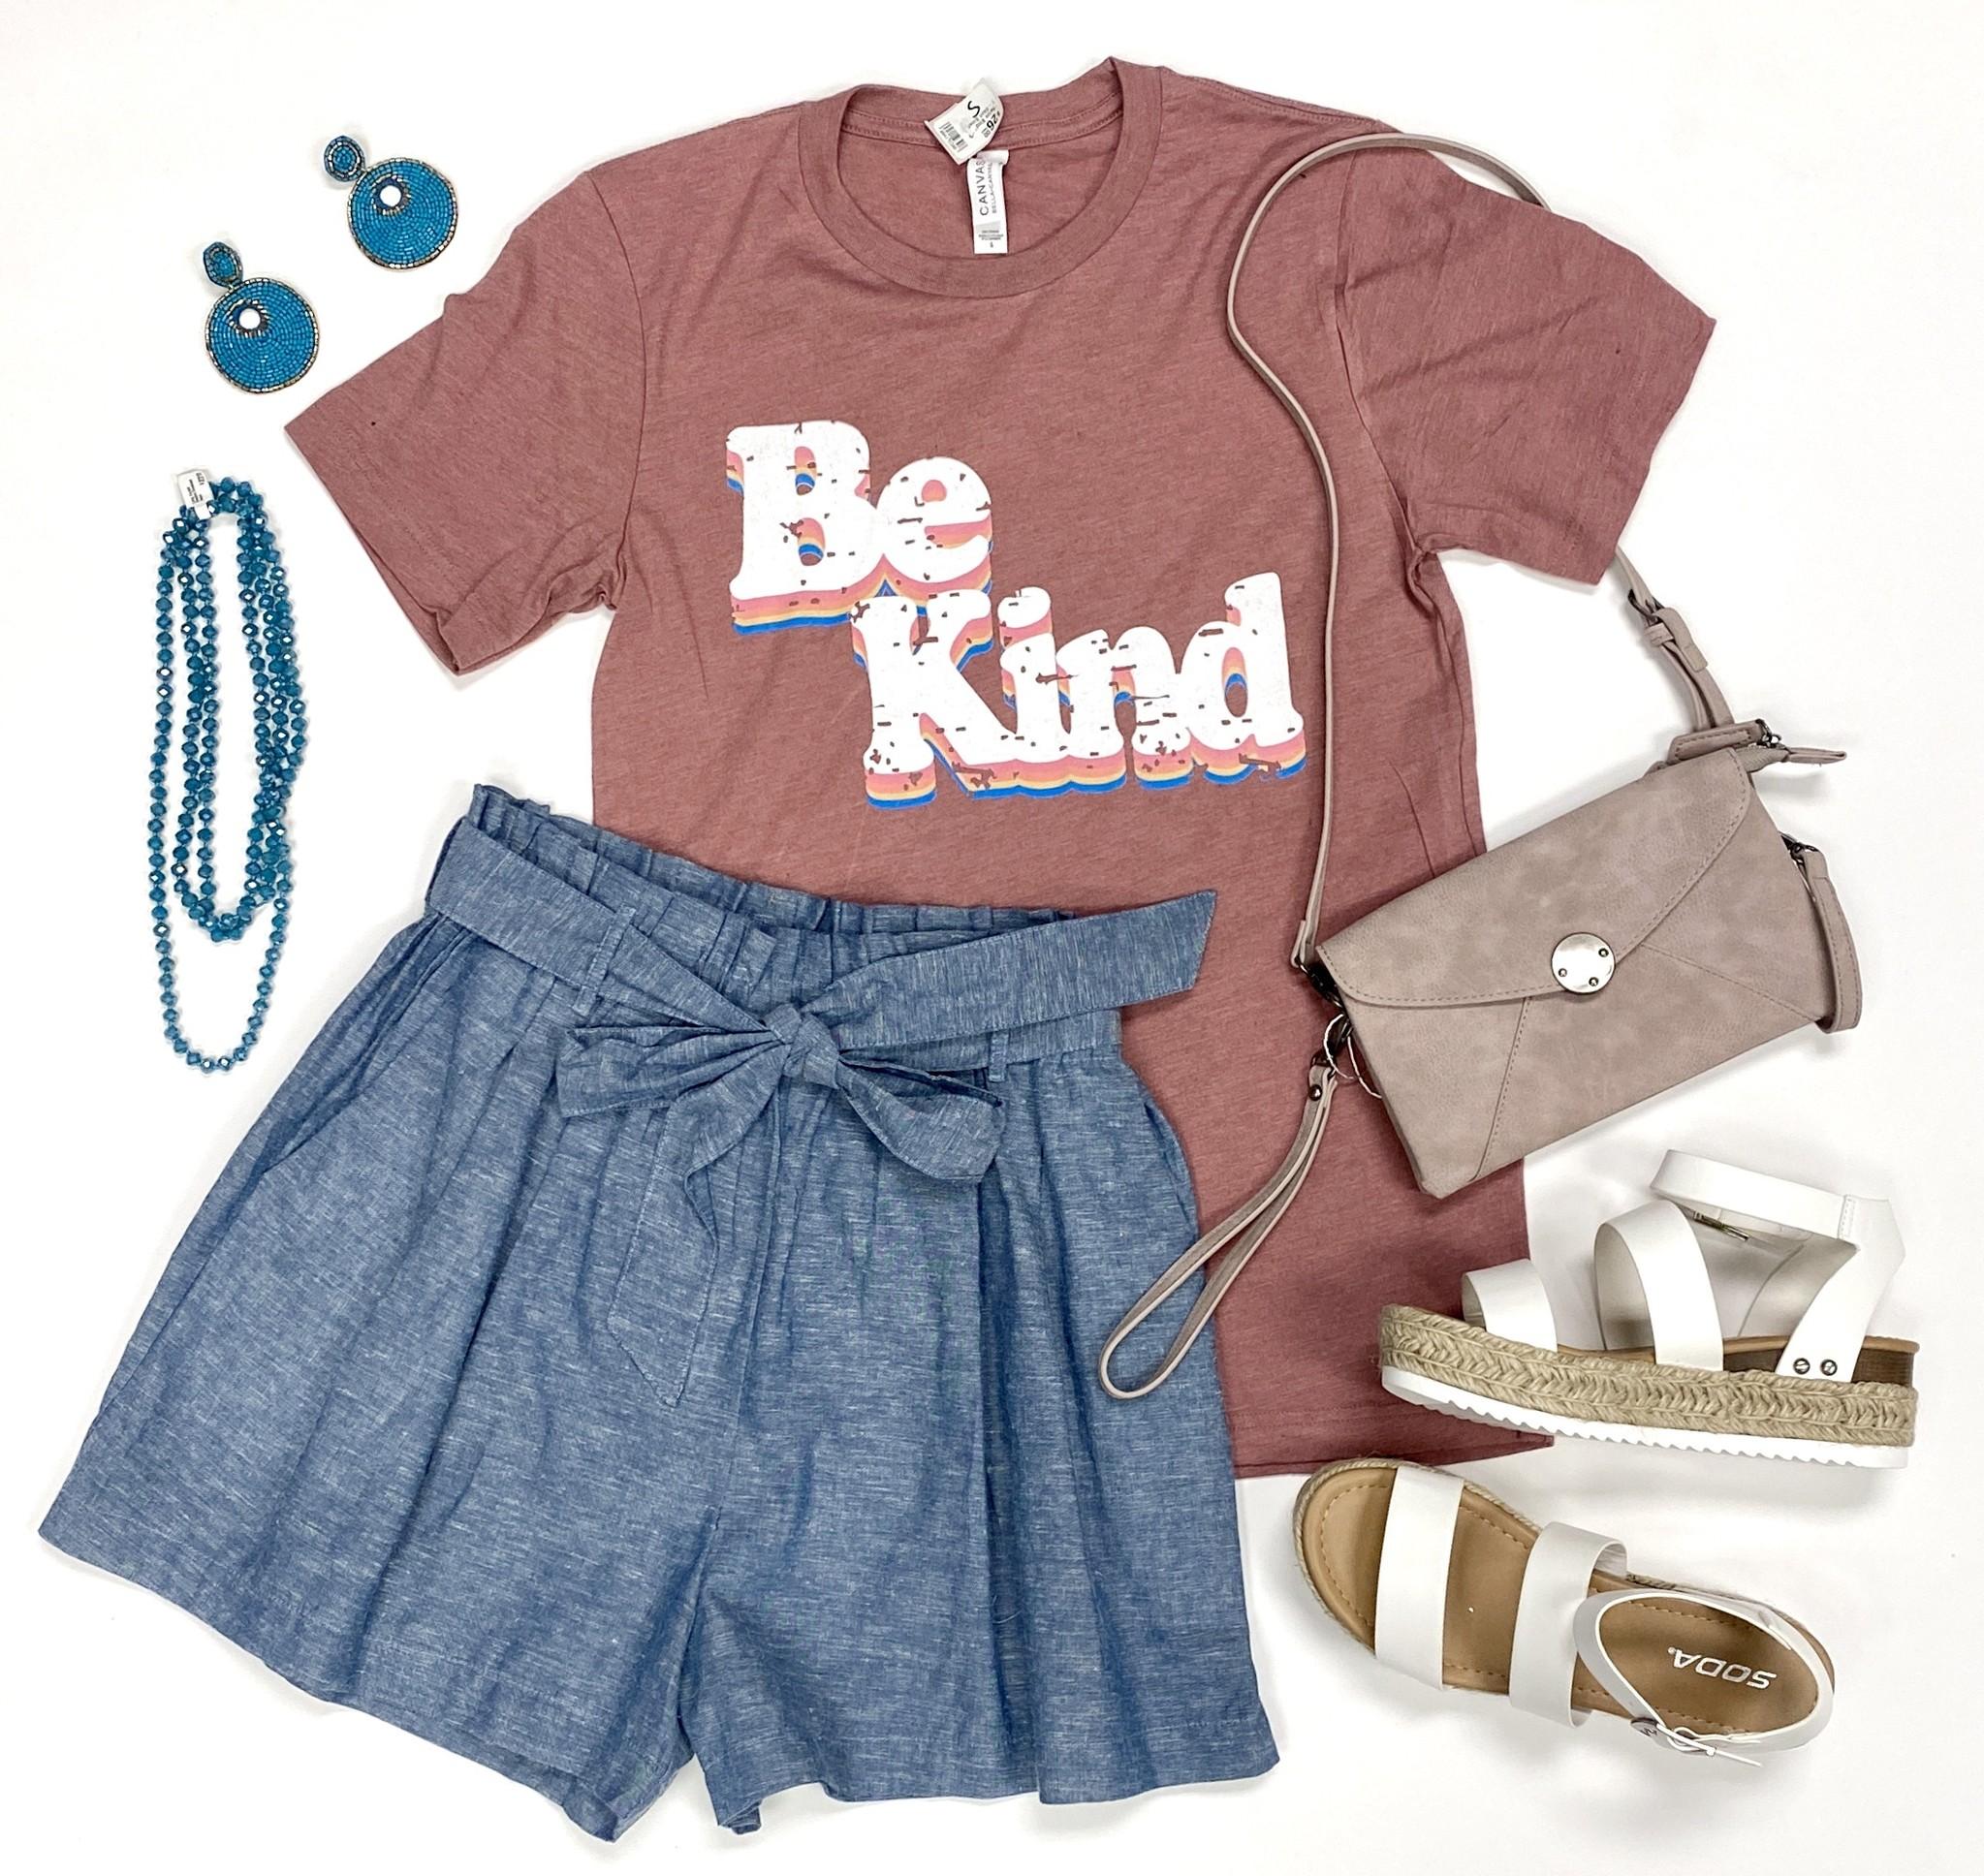 """Retro Kind"" T-Shirt"